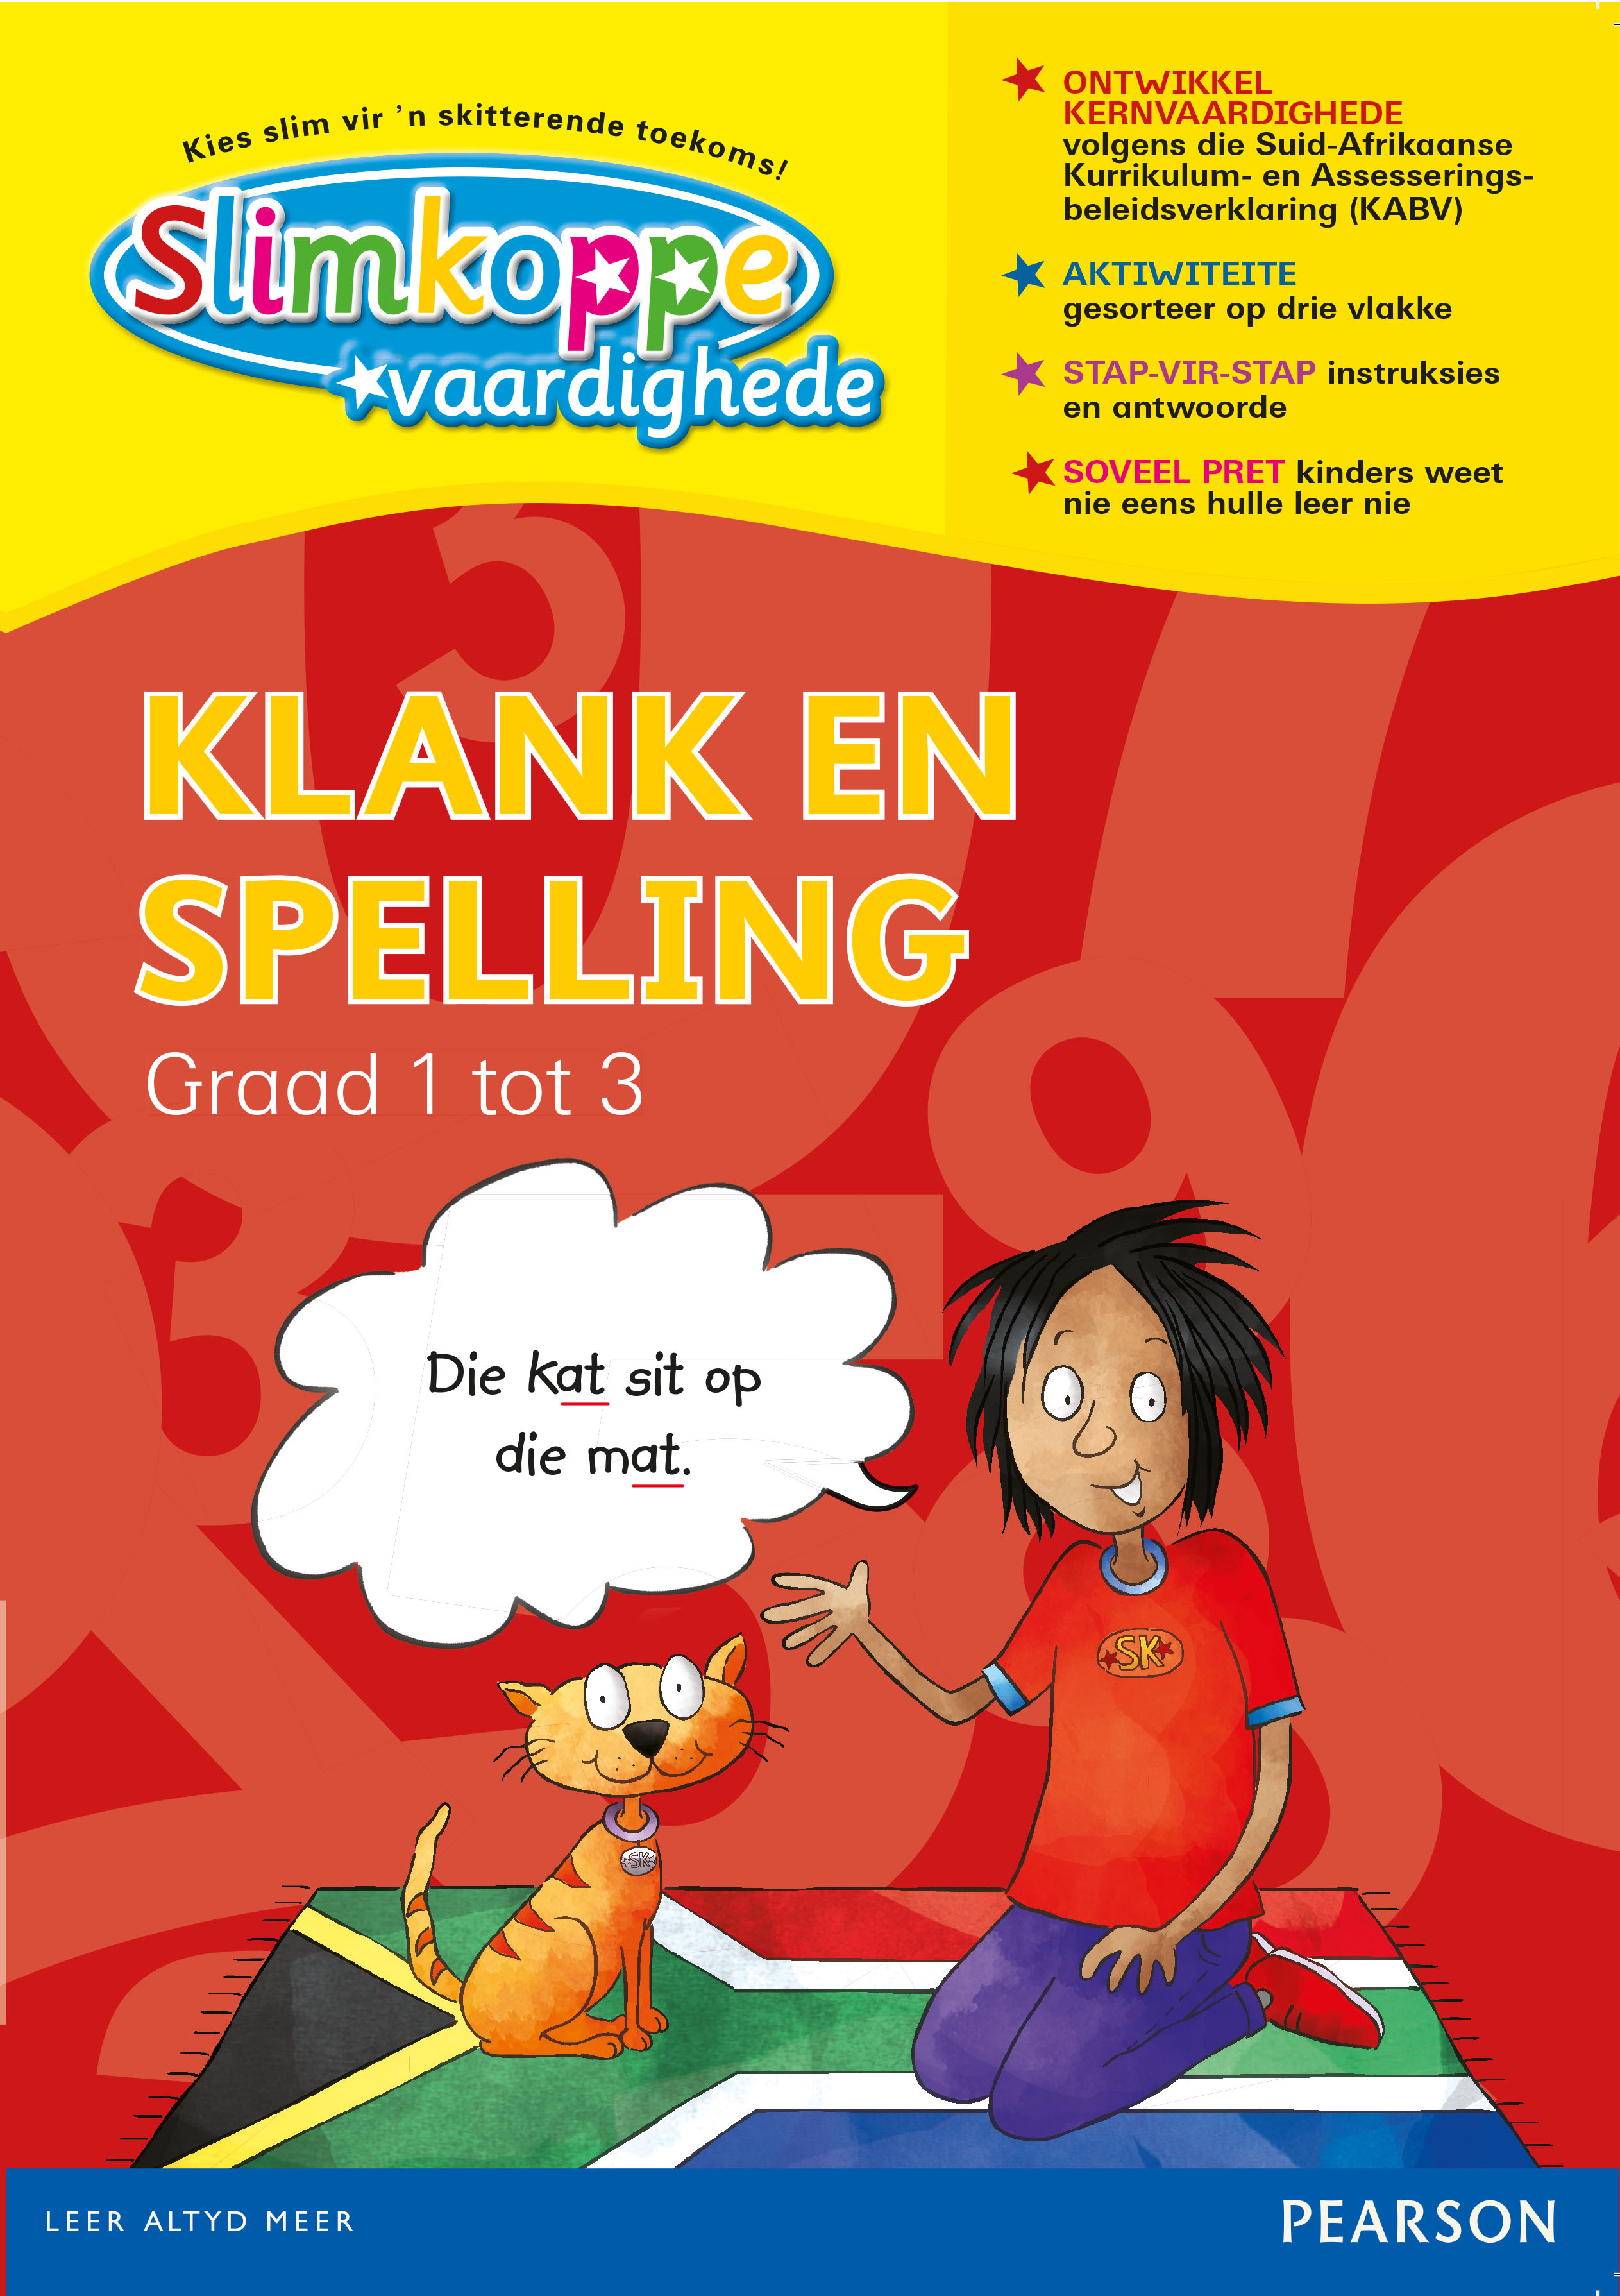 Picture of Slimkoppe Vaardighede: Klank en spelling: Grade 1, Grade 2, Grade 3